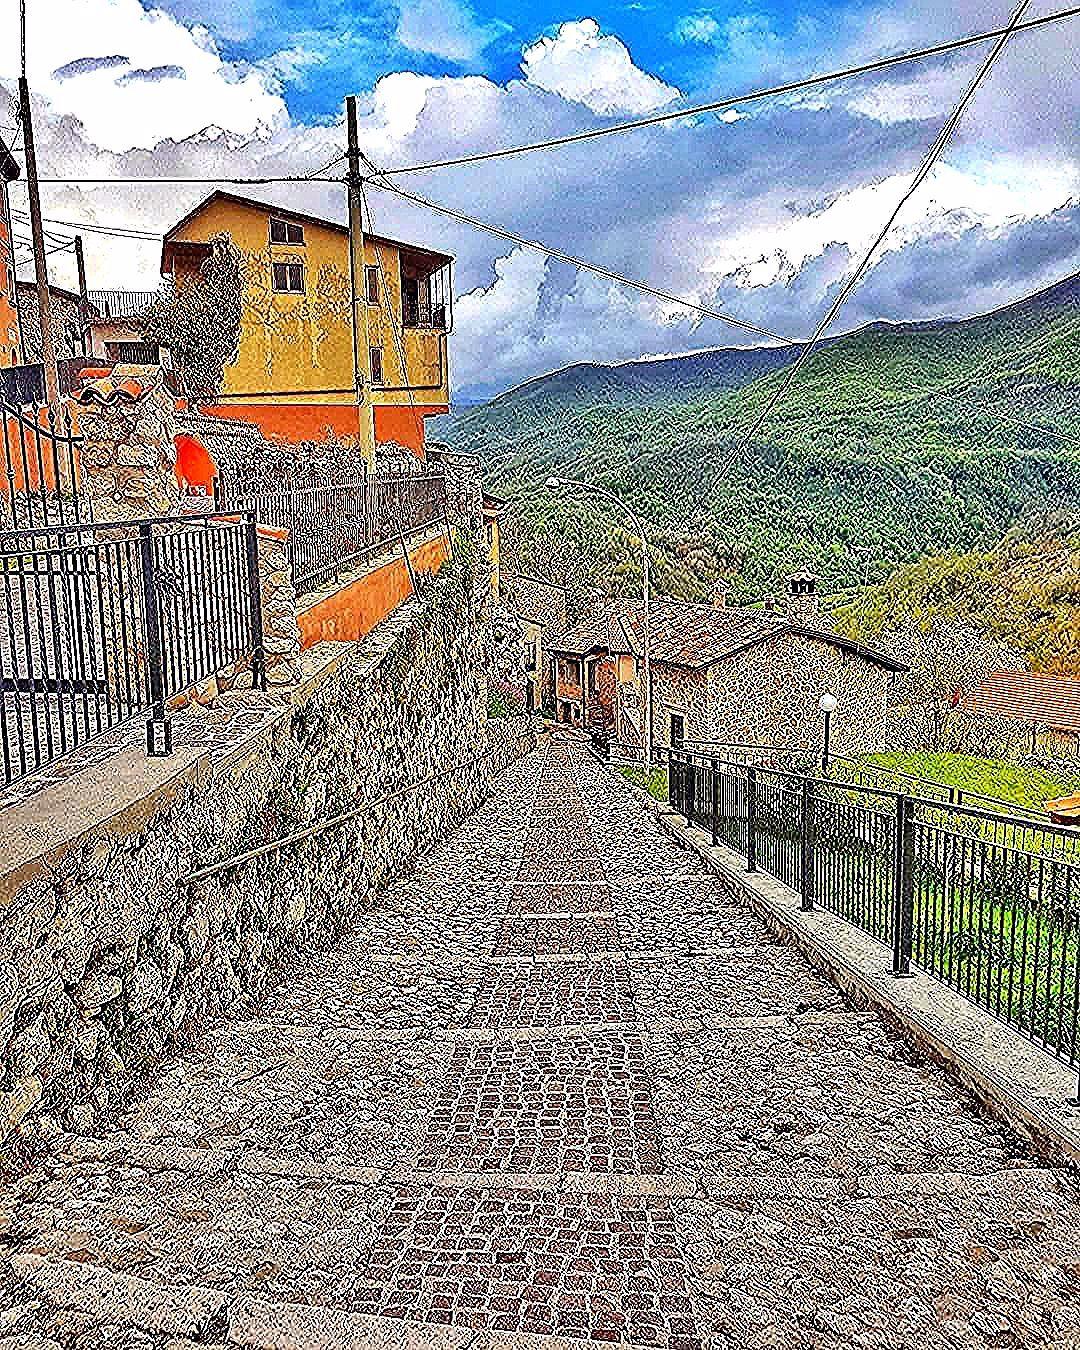 Petrella Liri     #abruzzo #petrellaliri #italy #ig_abruzzo #ig_italia #italia_inunoscatto  Petrella Liri     #abruzzo #petrellaliri #italy #ig_abruzzo #ig_italia #italia_inunoscatto #nature #water #sun #travel #traveling #TFLers #vacation #visiting #instatravel #instago #instagood #trip #holiday #saturday #photooftheday #fun #travelling #tourist #instatraveling #travelgram #igtravel